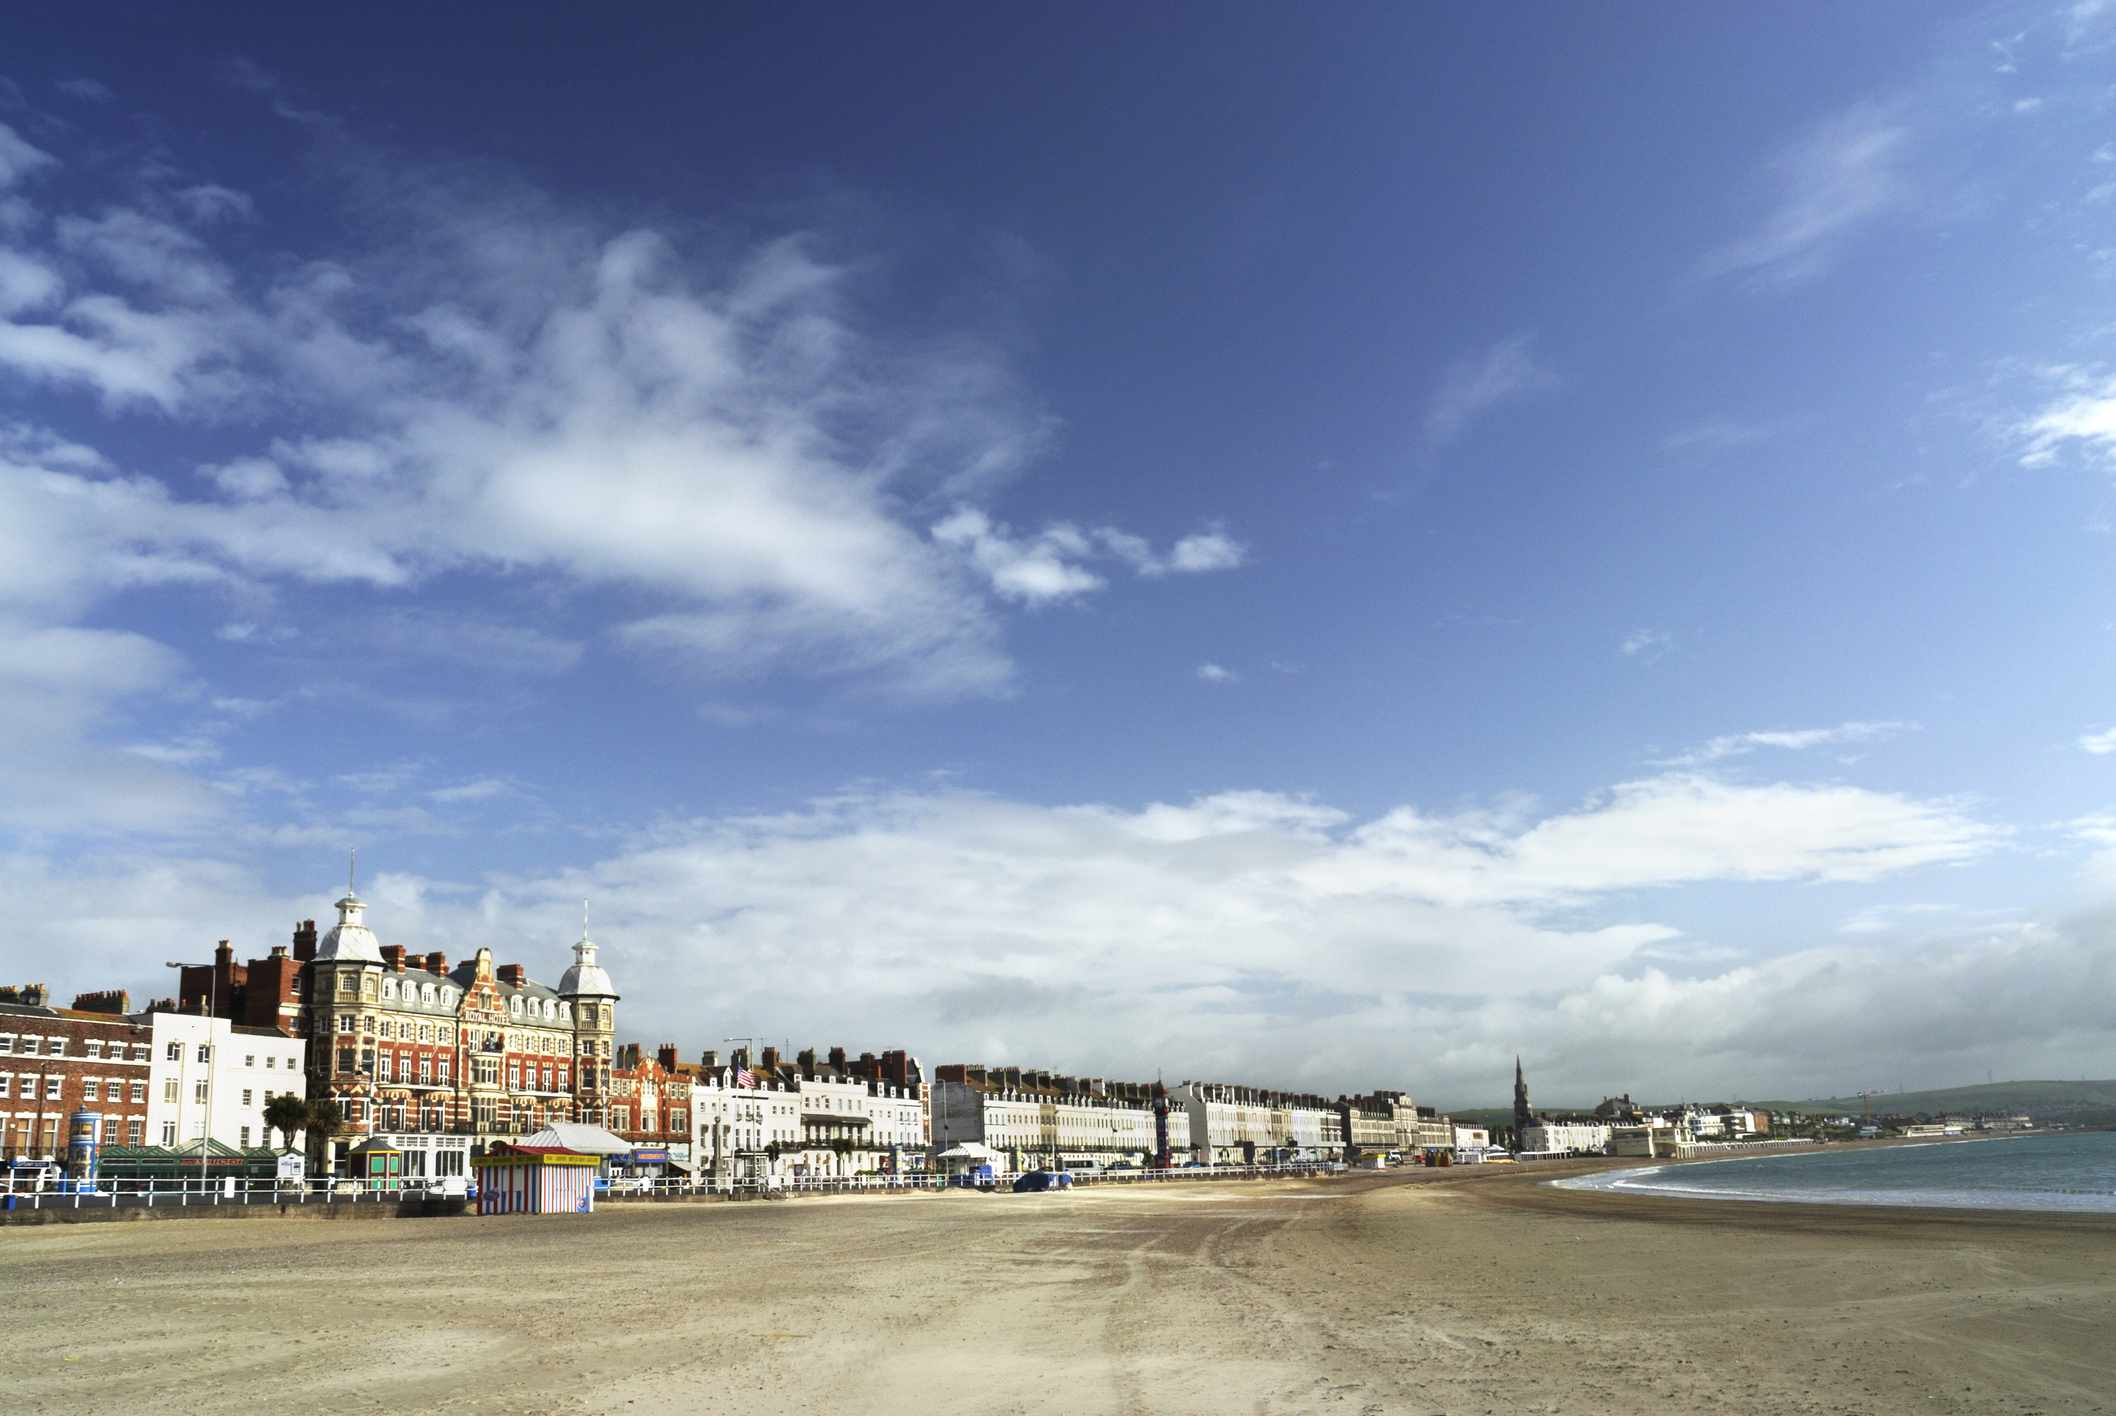 Weymouth Beach in Dorset, England